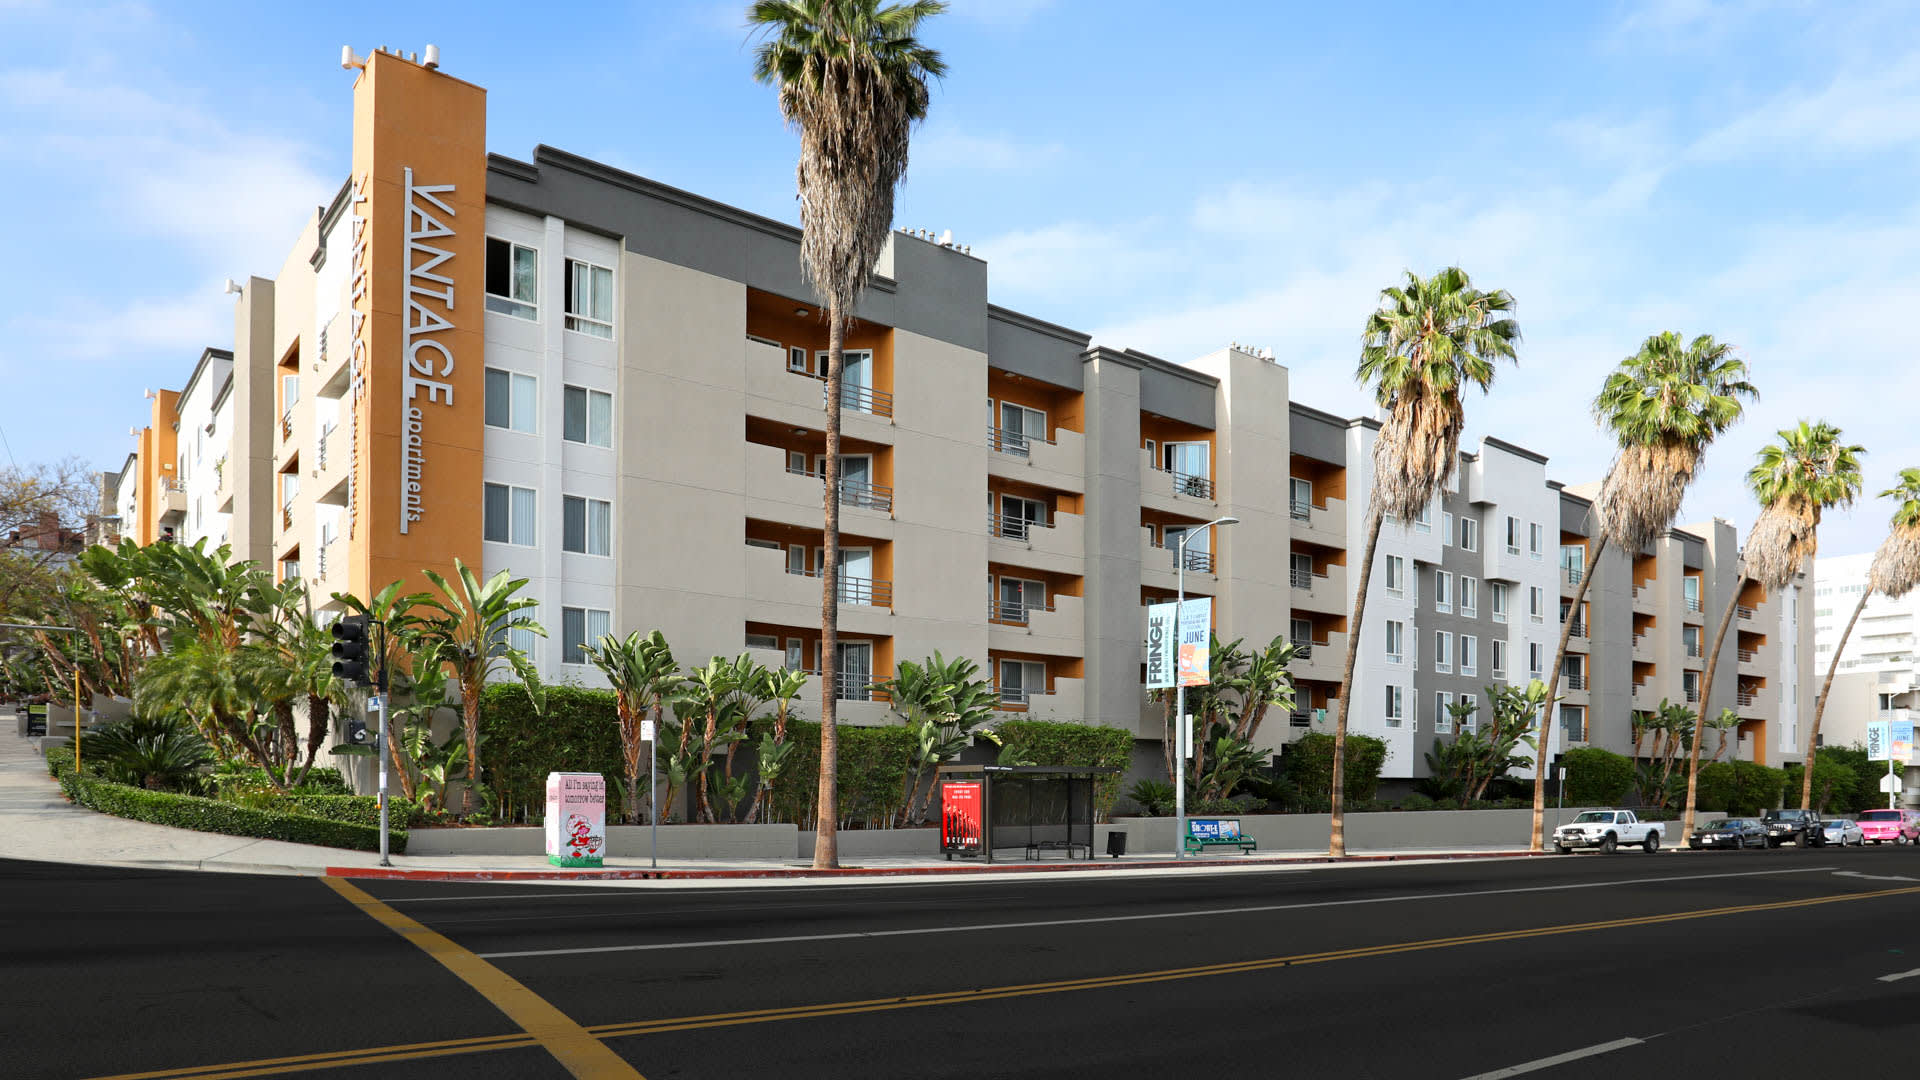 Vantage Hollywood Apartments - Exterior